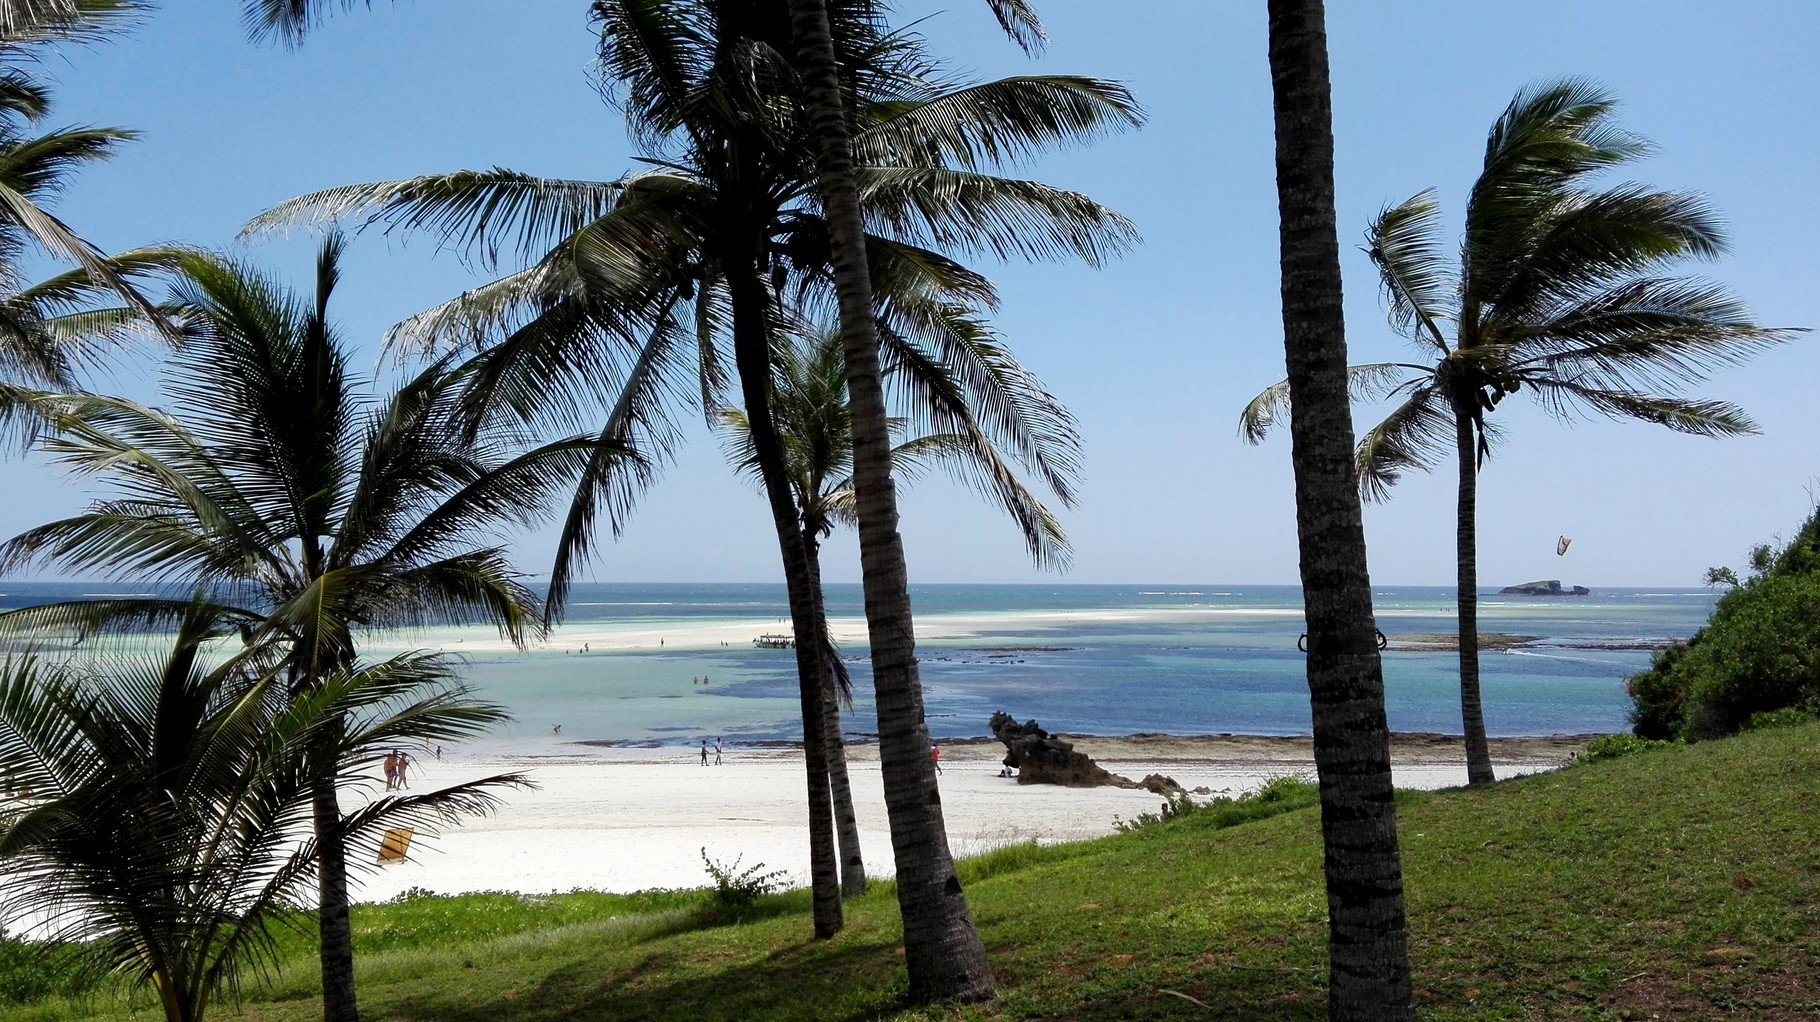 Kenya Vacanze - Turtle beach, Watamu